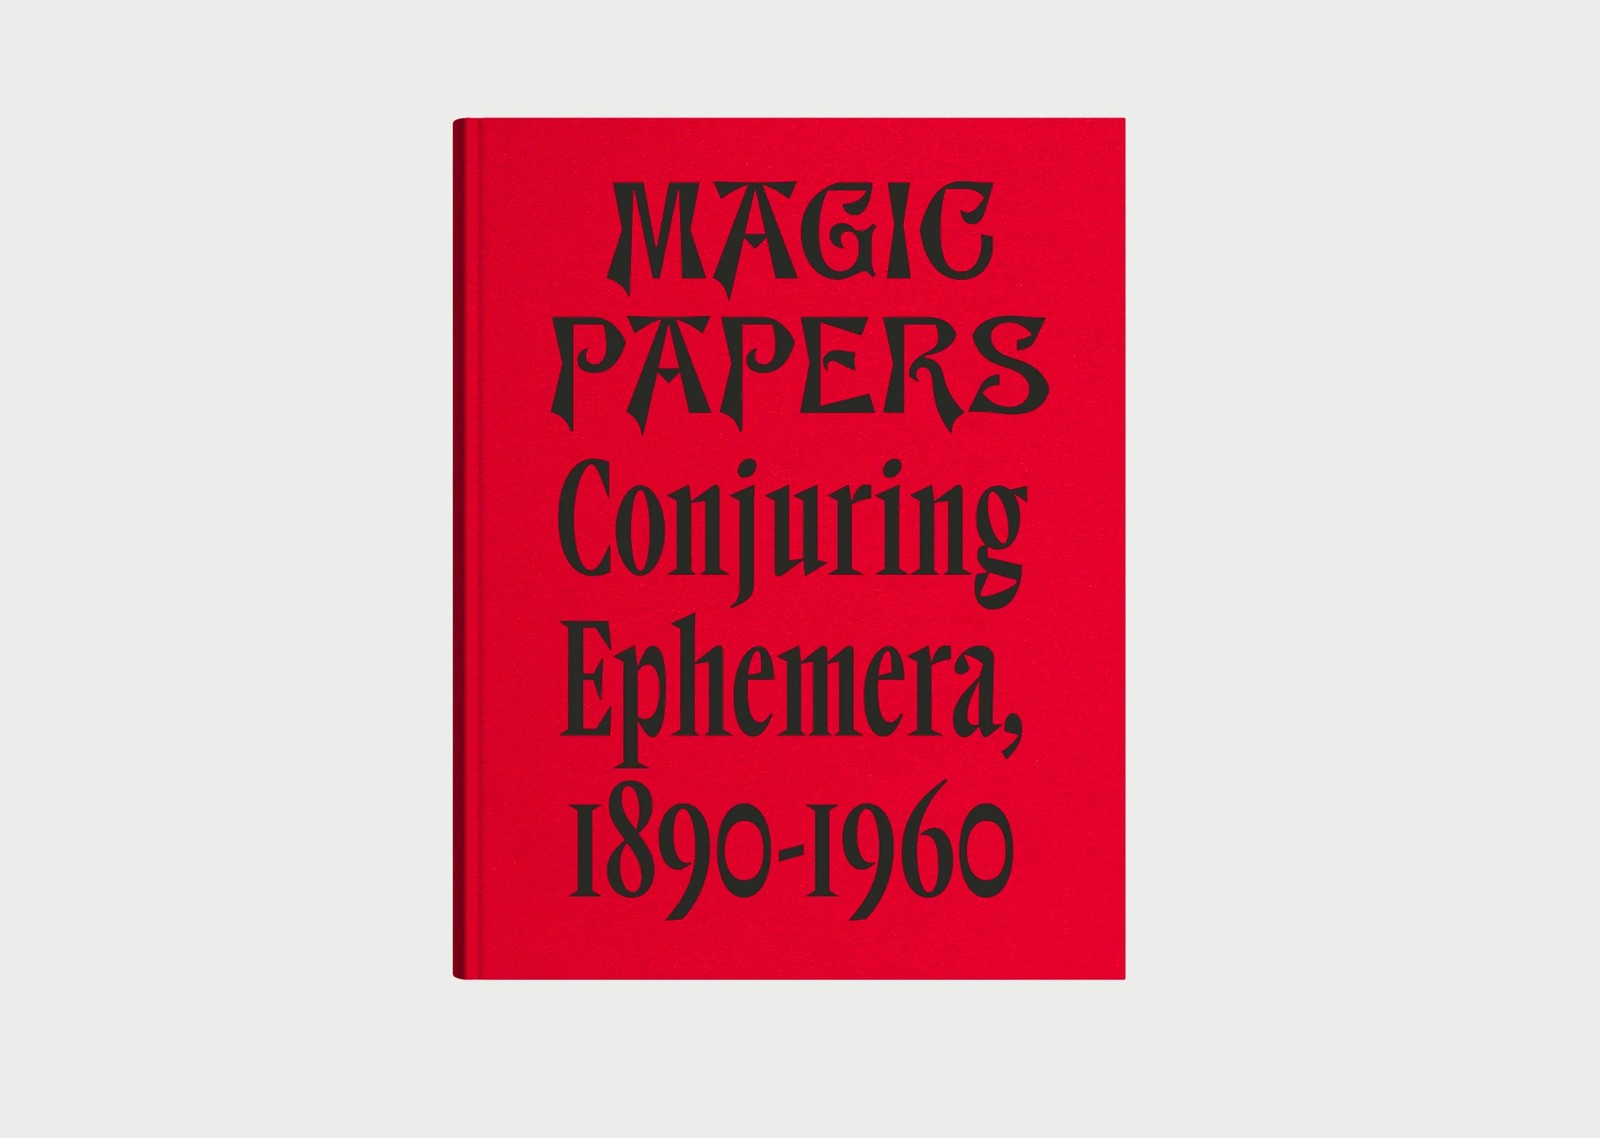 centrecentre magic papers 1